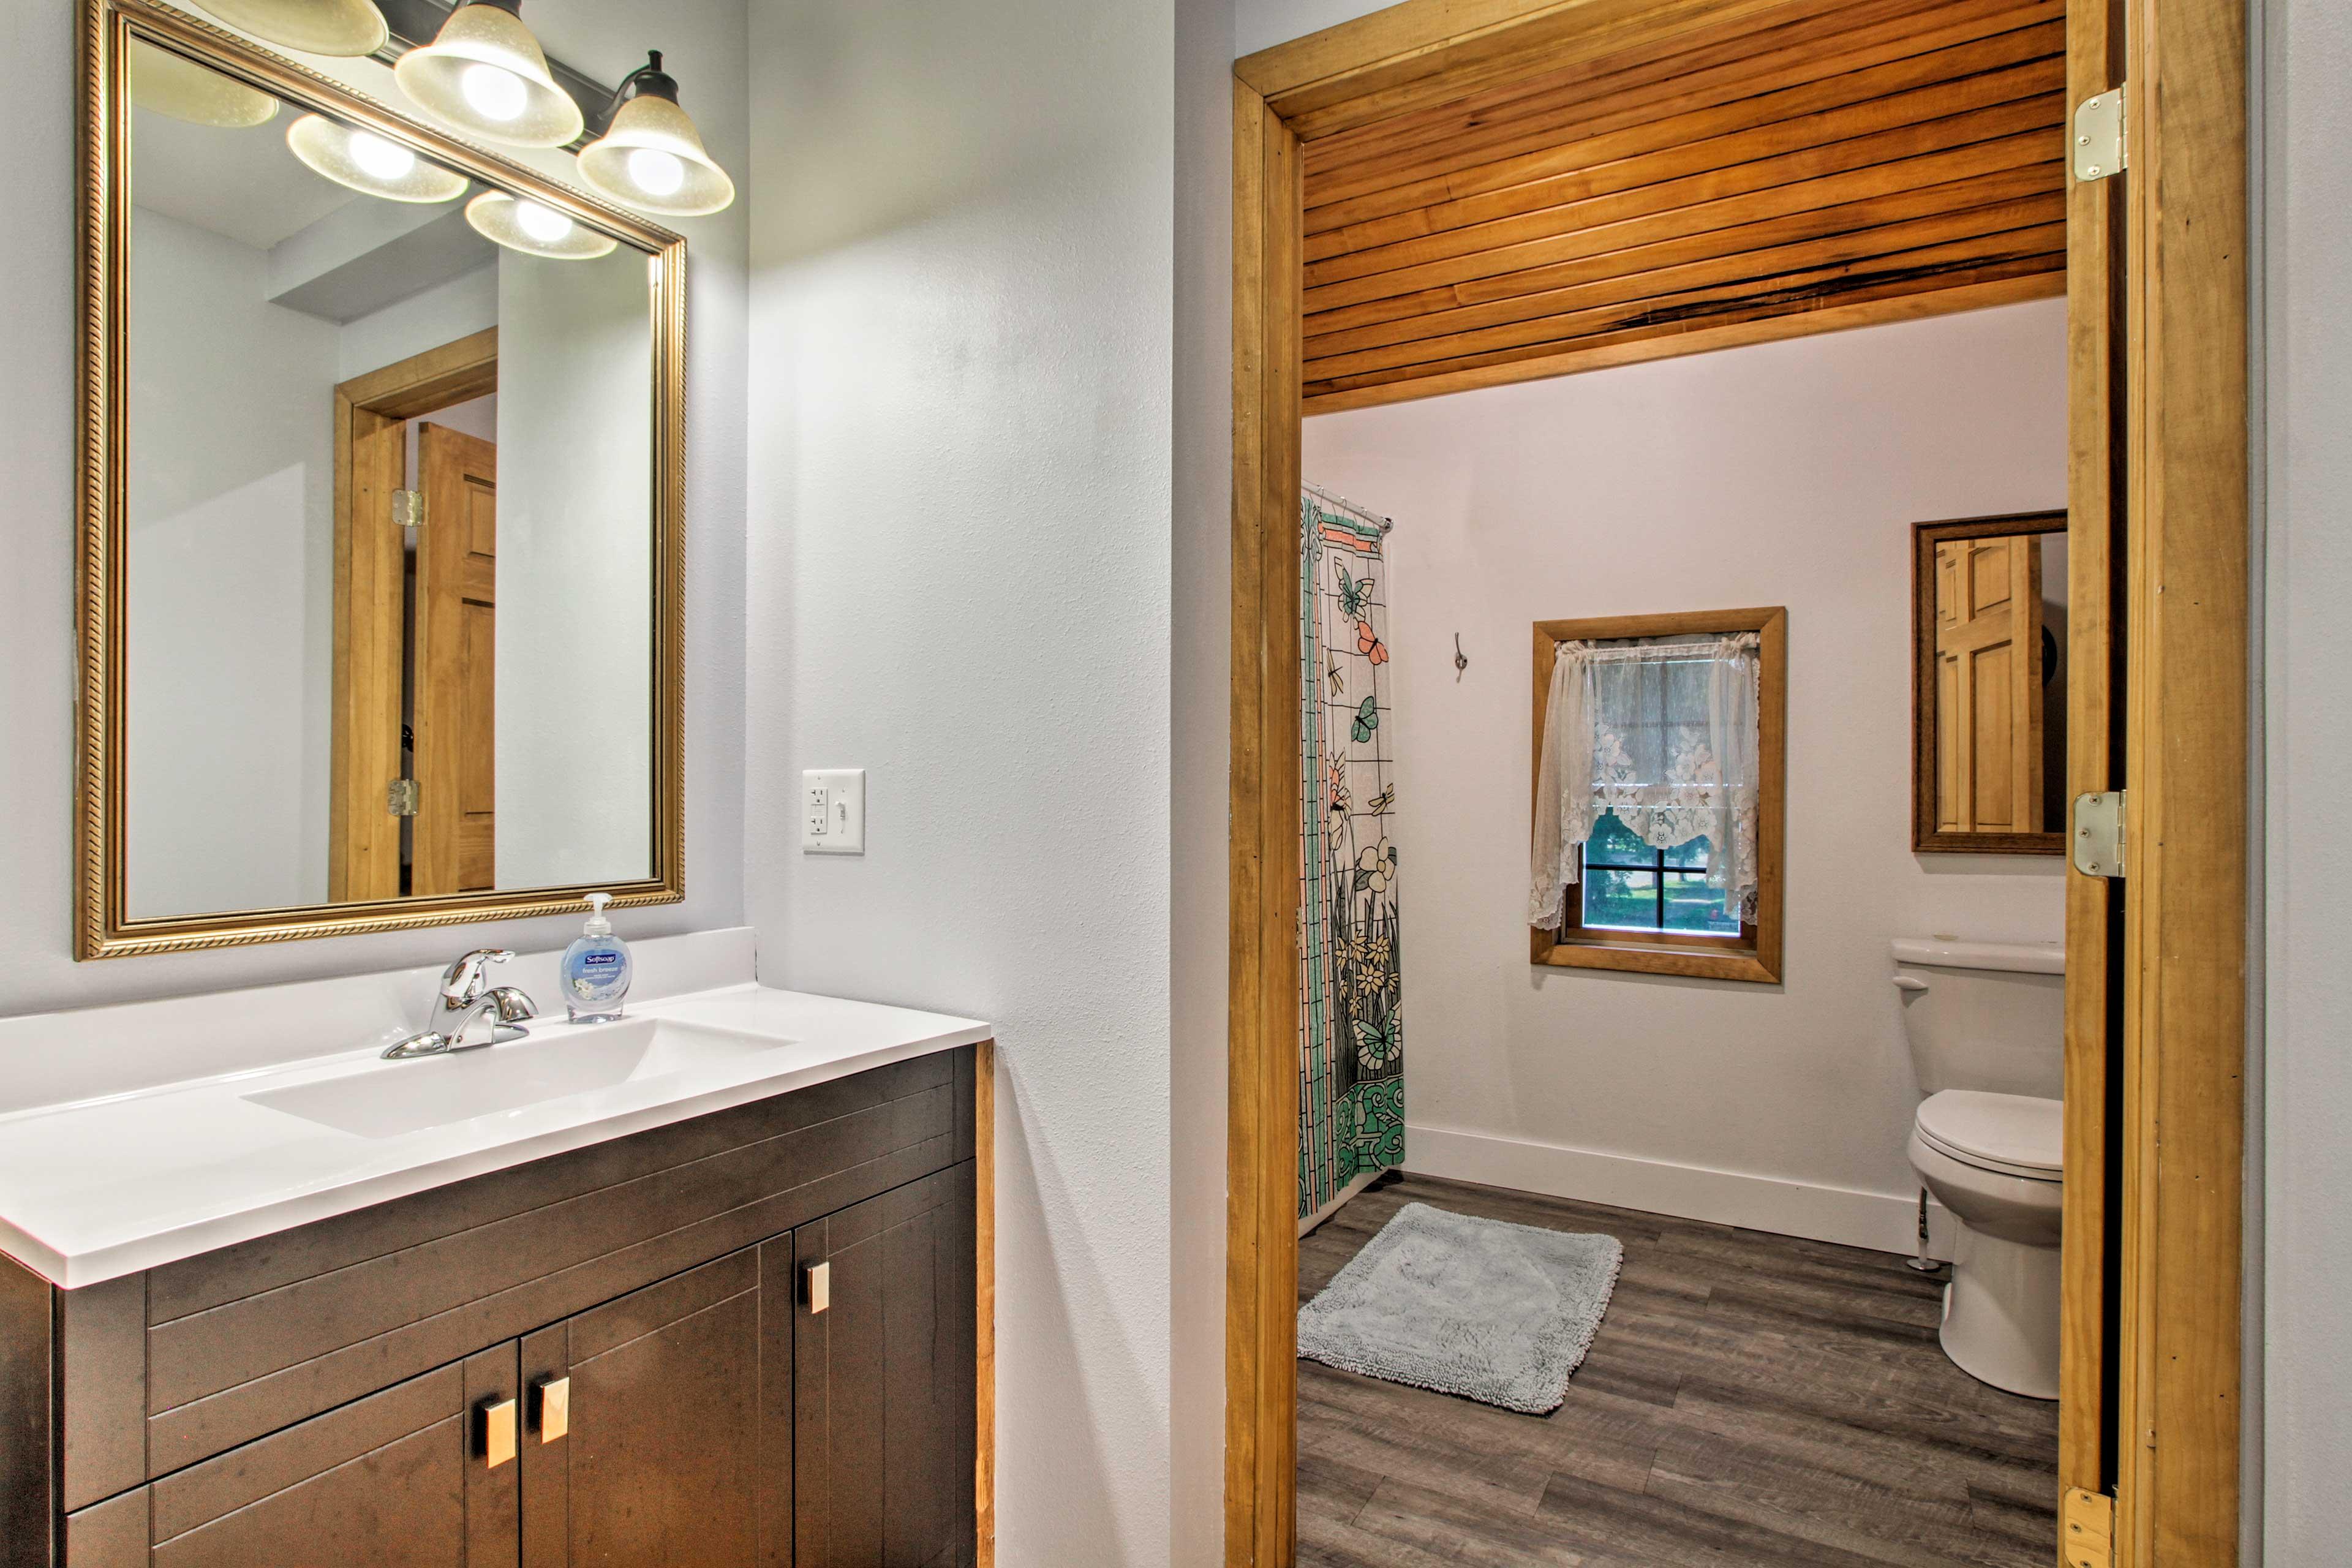 The spacious bathroom hosts a shower/tub combo.